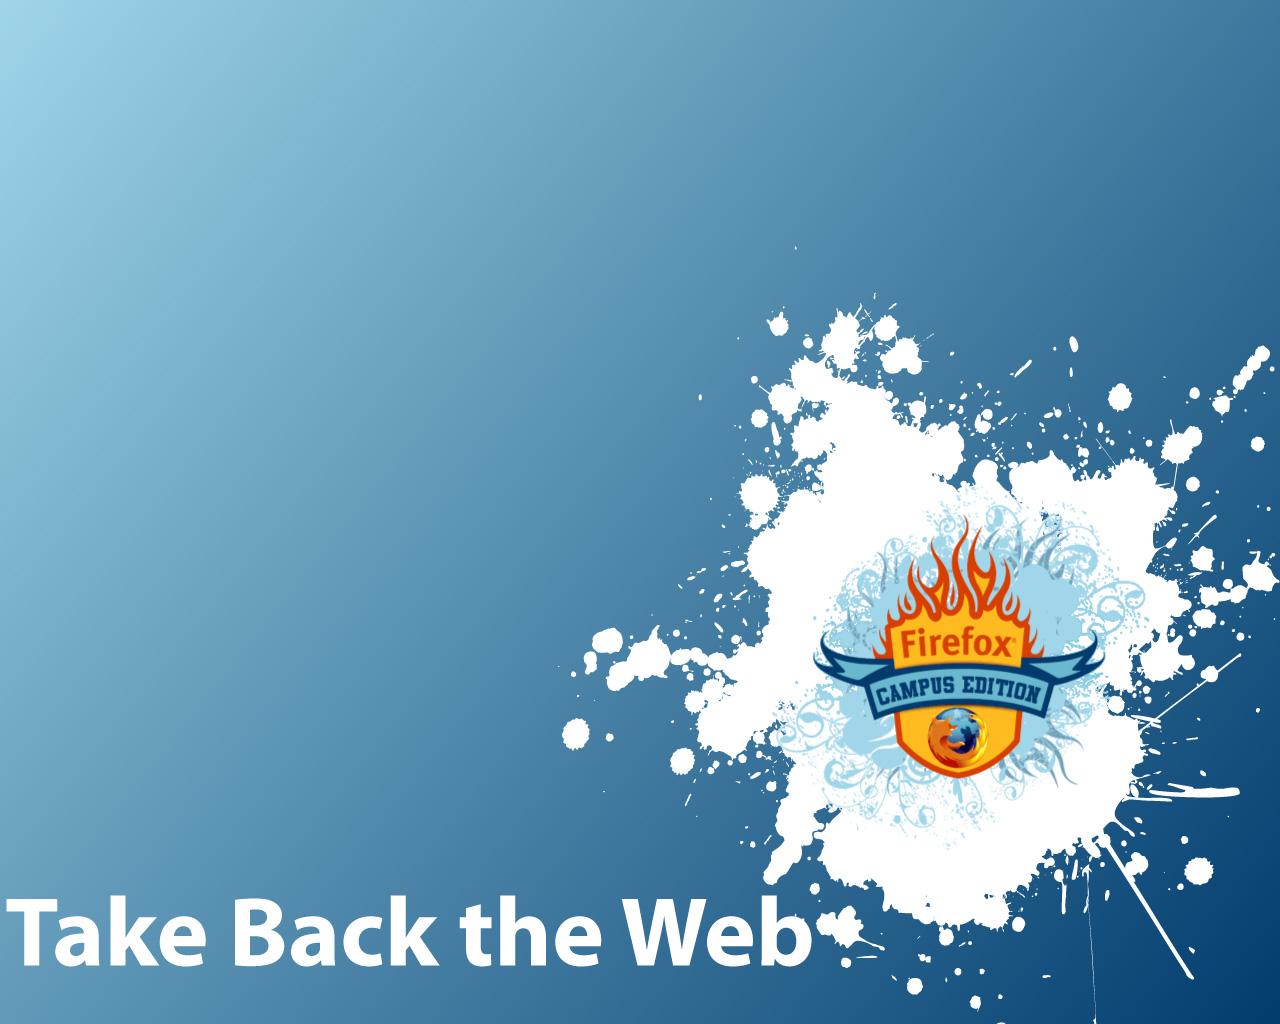 Firefox Campus Edition Windows